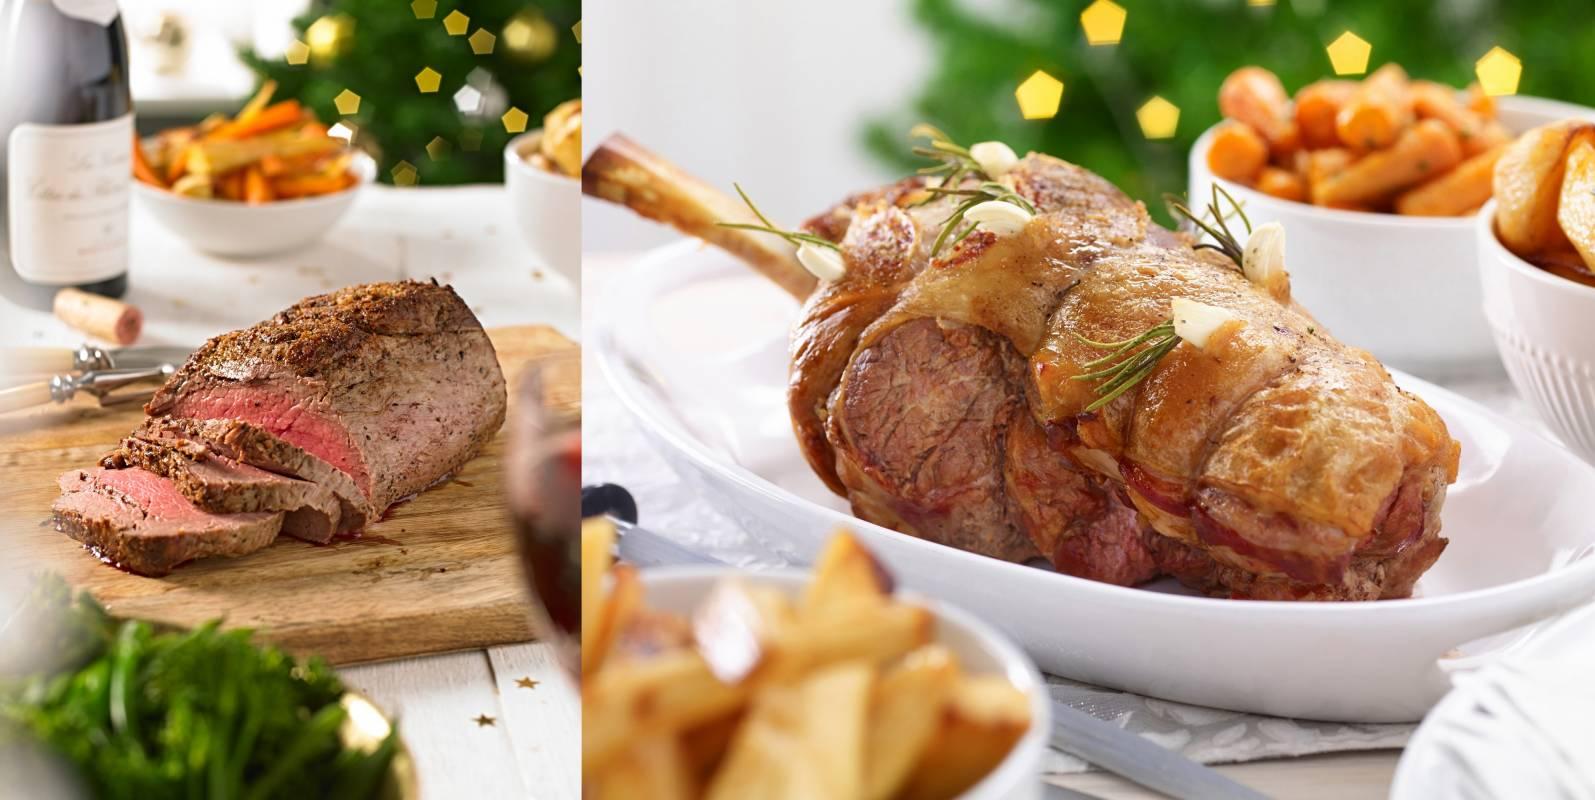 Roast beef, roast pork, Sunday lunch